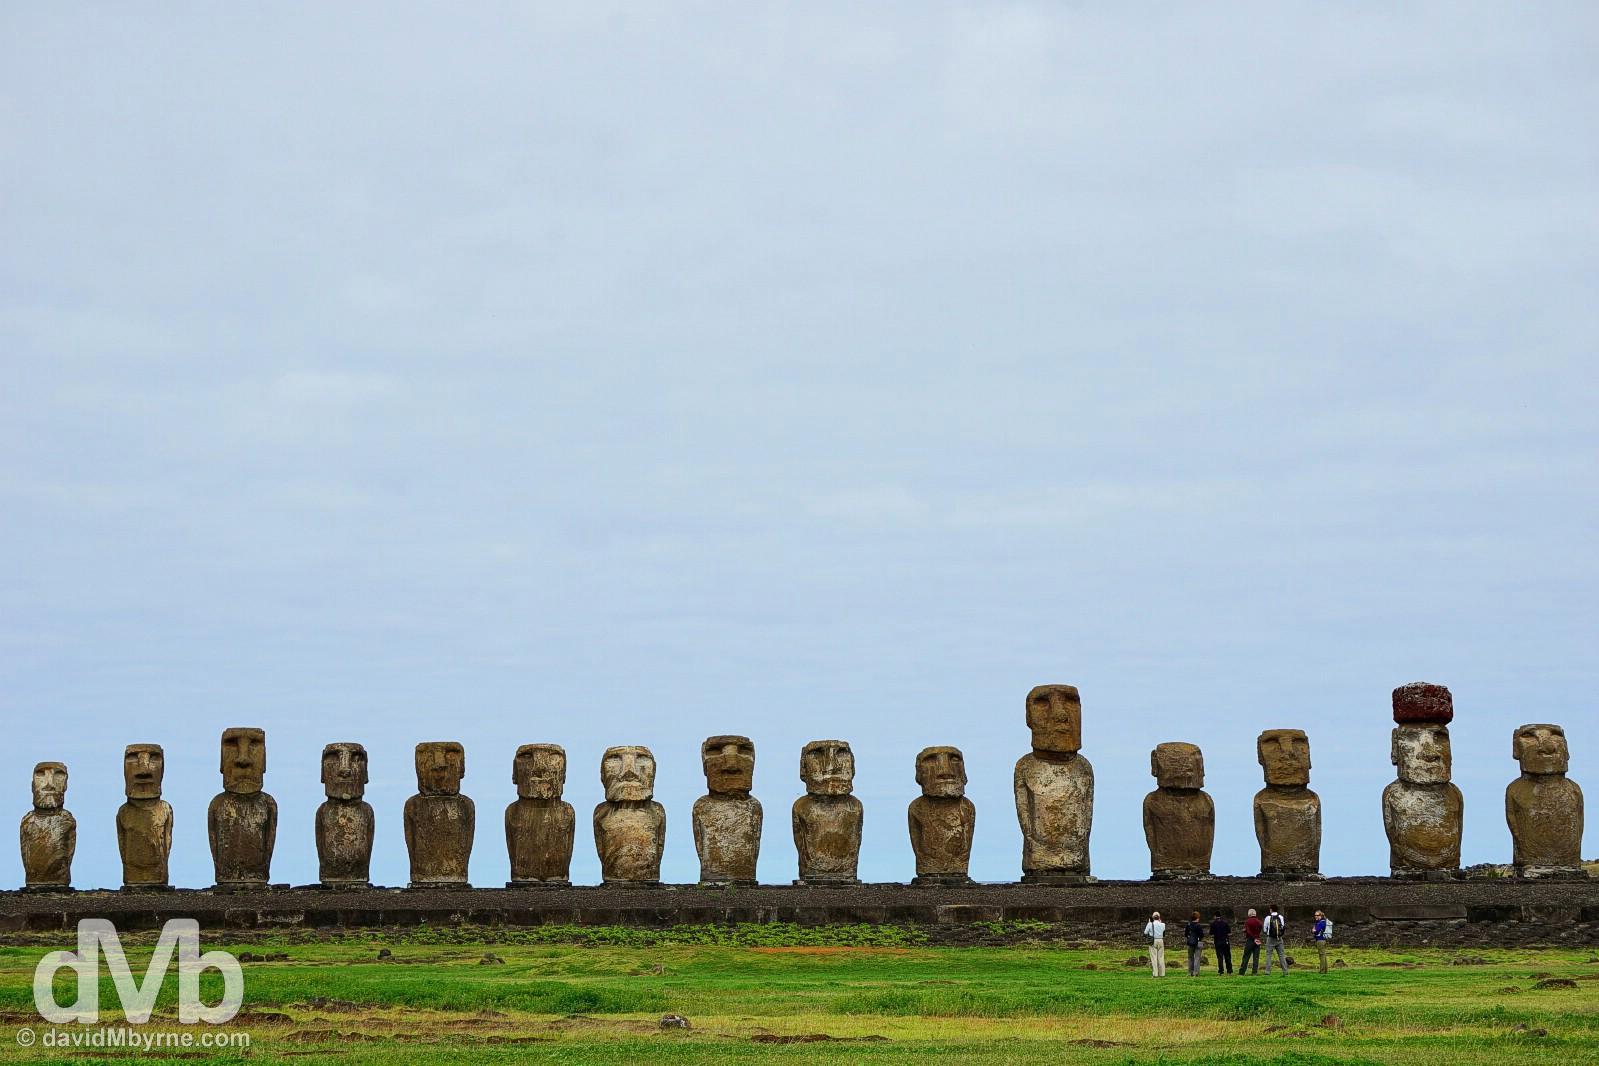 The moai of Ahu Tongariki on Easter Island, Chile. September 29, 2016.